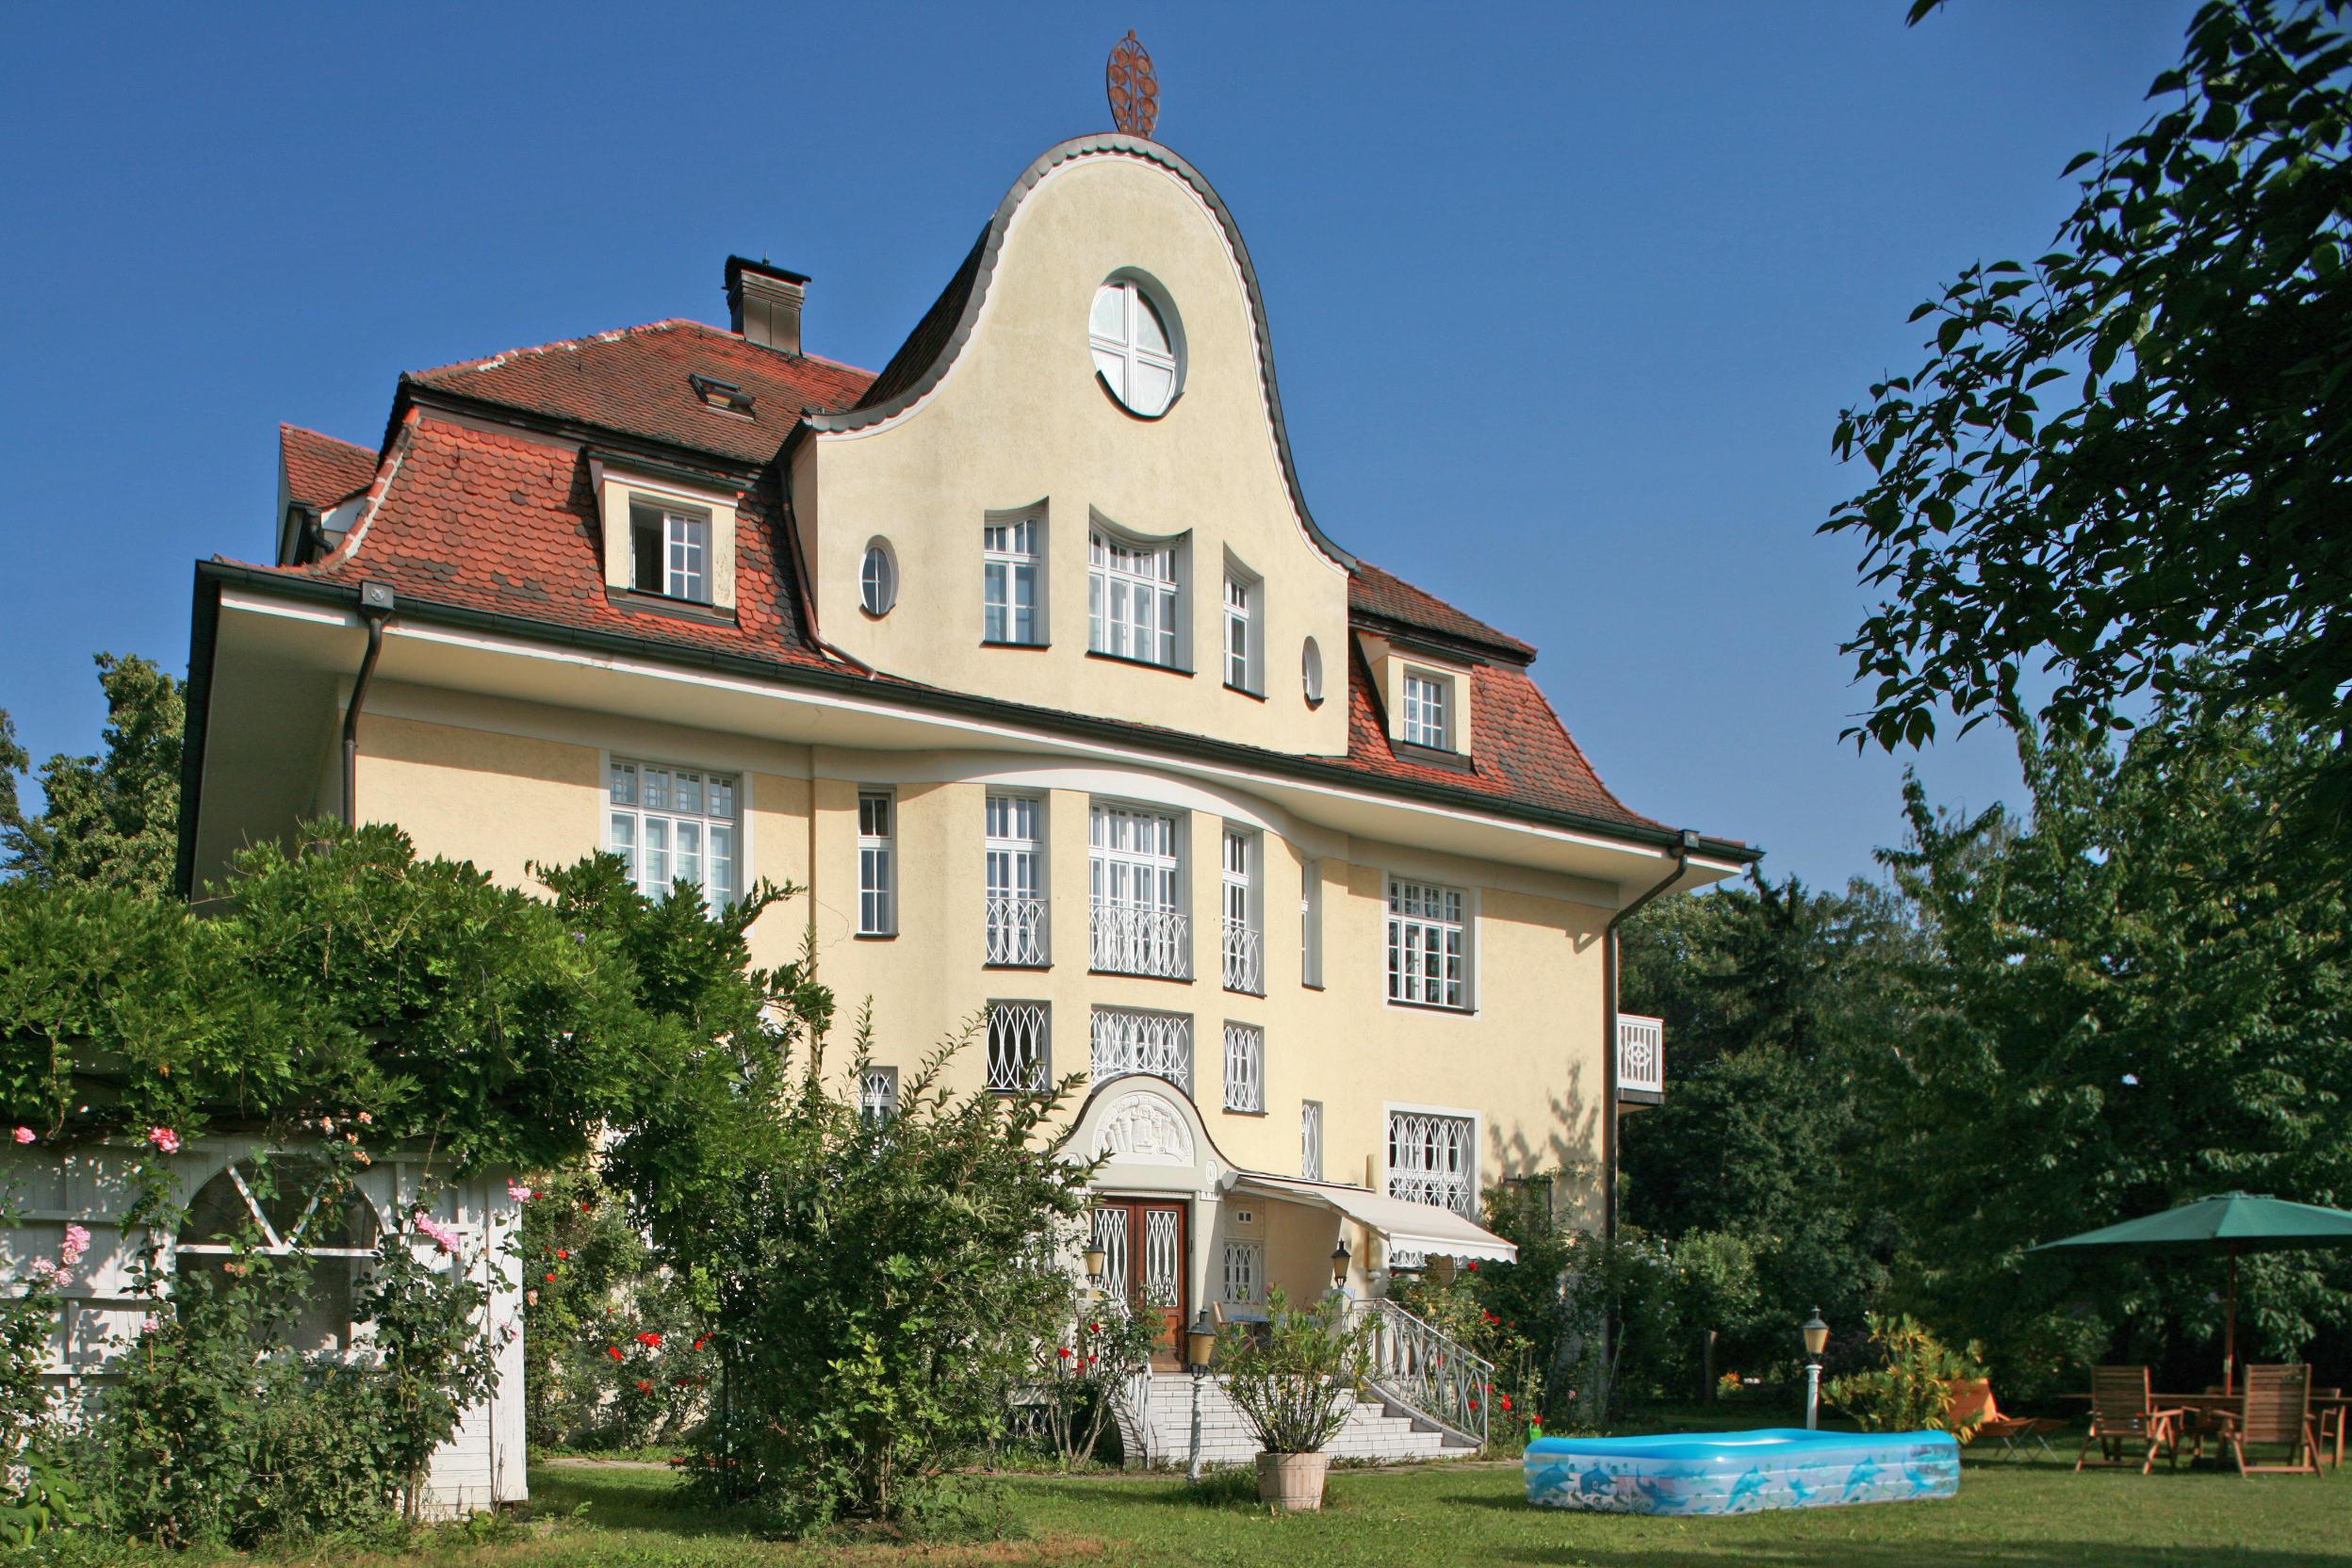 Bild der Immobilien Konzog